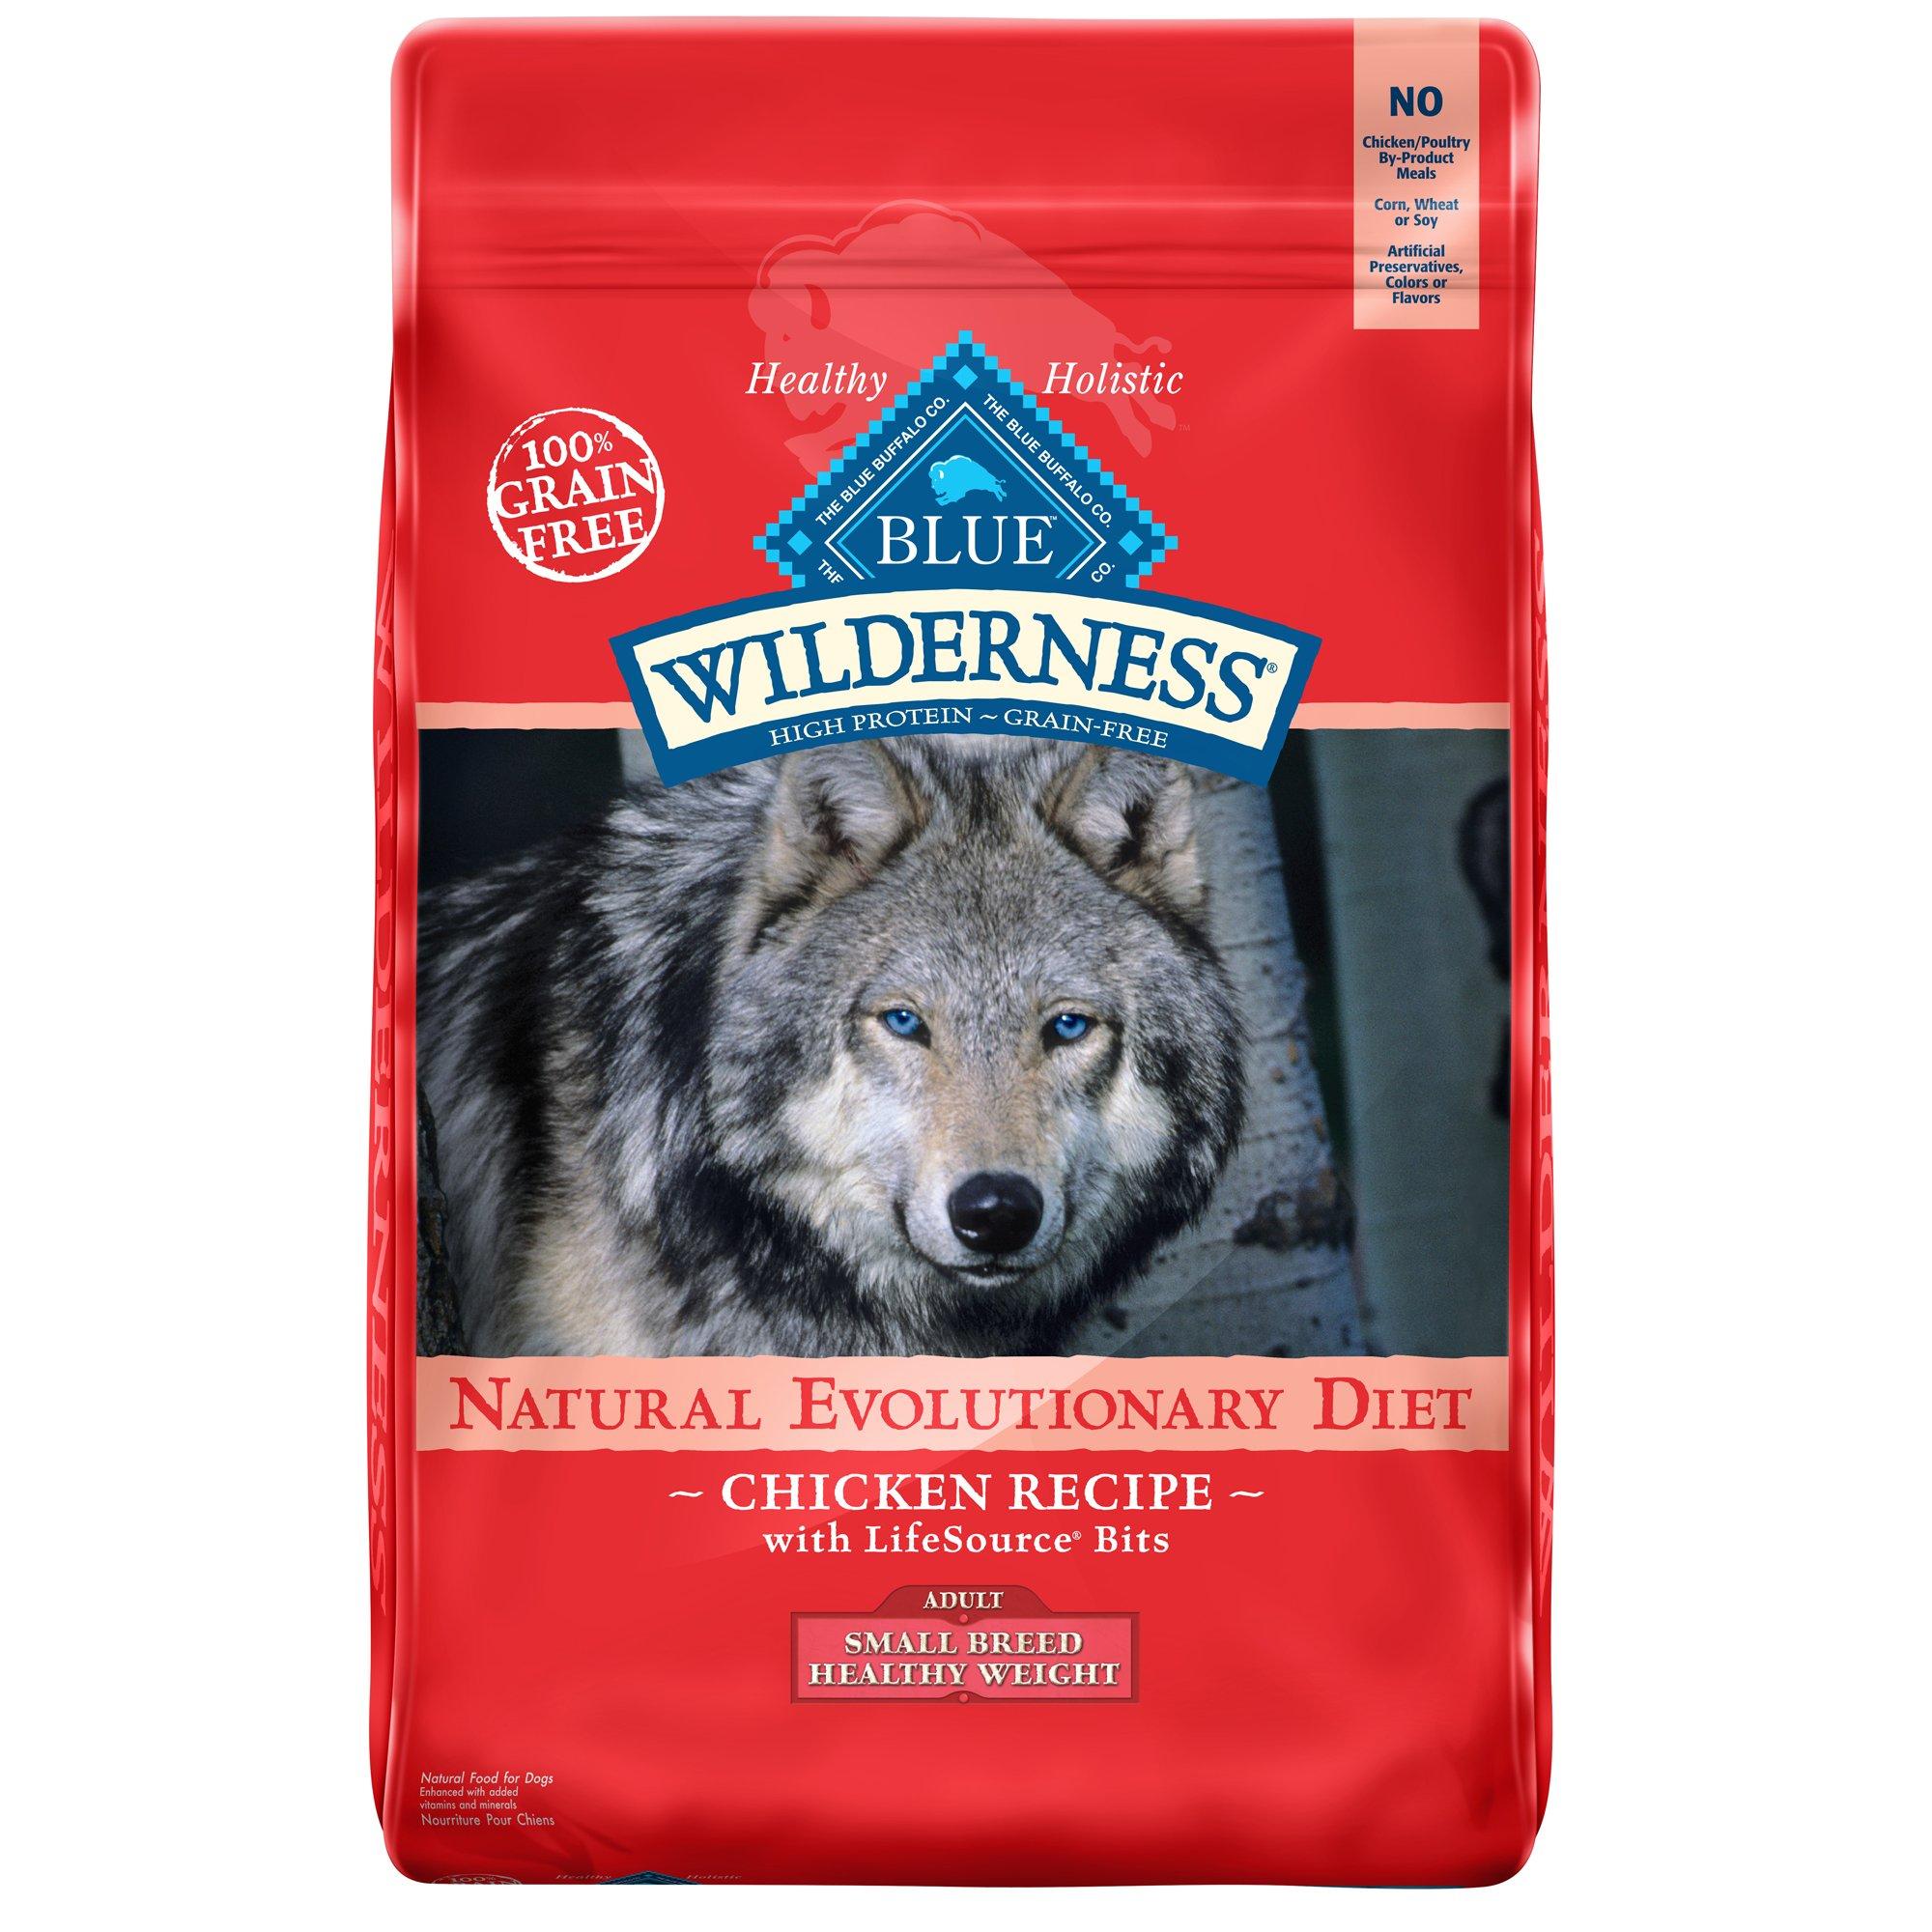 Petco Blue Buffalo Small Breed Dog Food